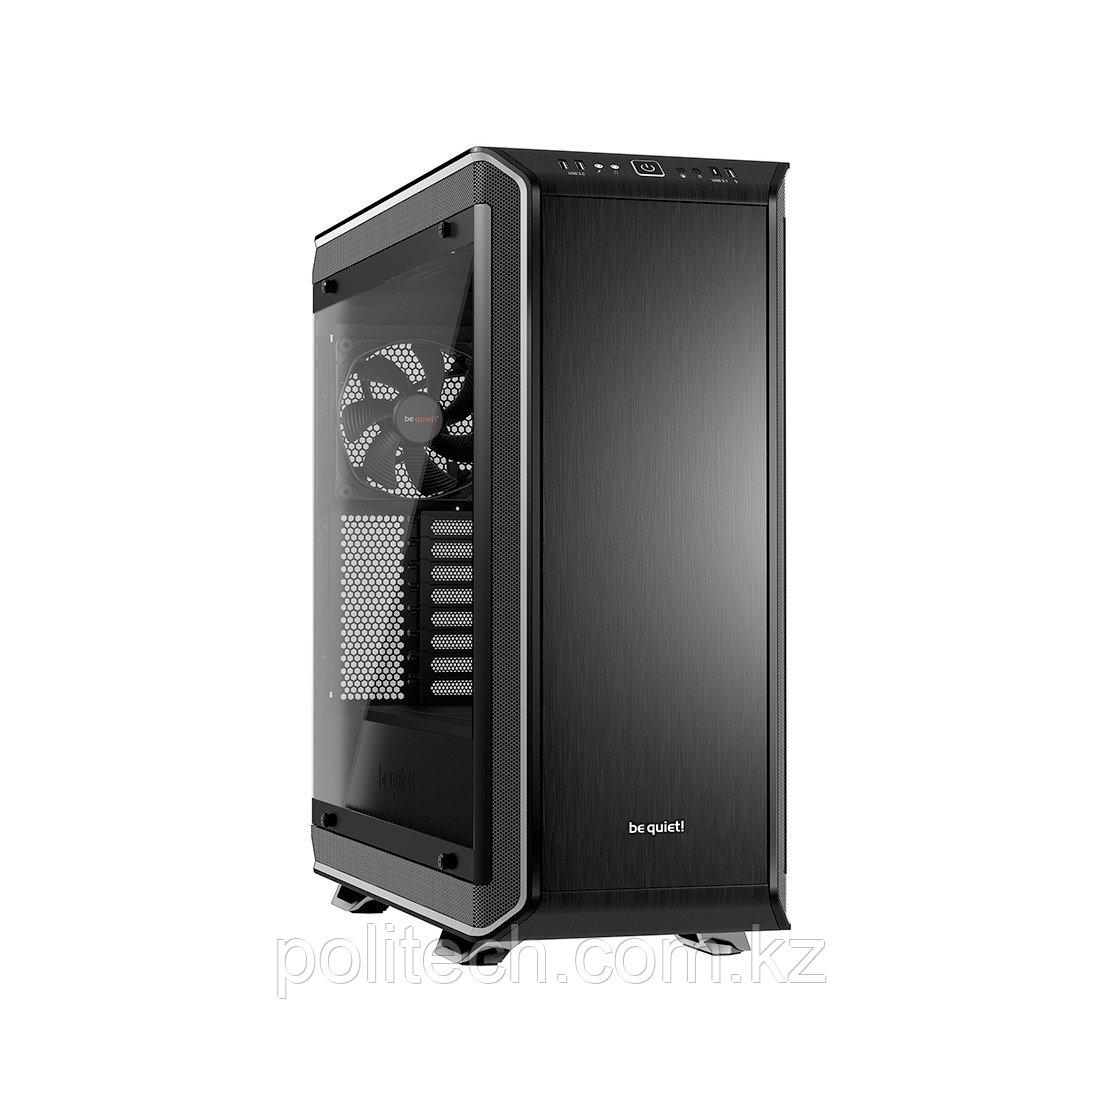 Компьютерный корпус Bequiet! Dark Base Pro 900 Silver rev.2